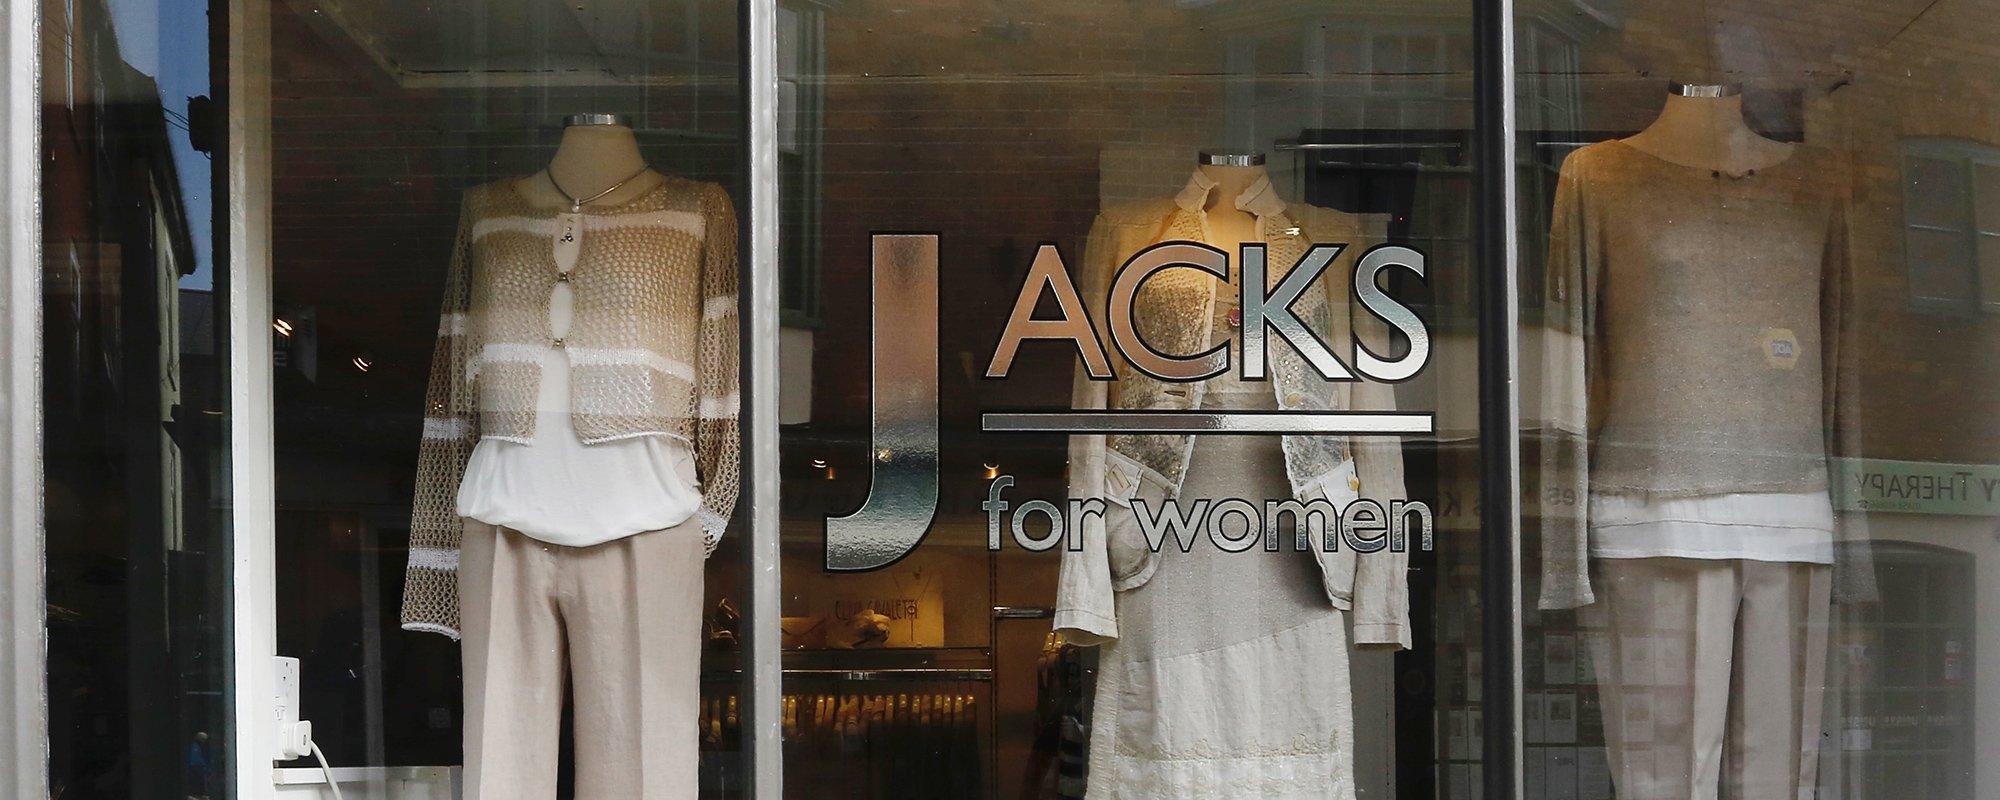 Shopfront of a women's clothing boutique in Market Harborough